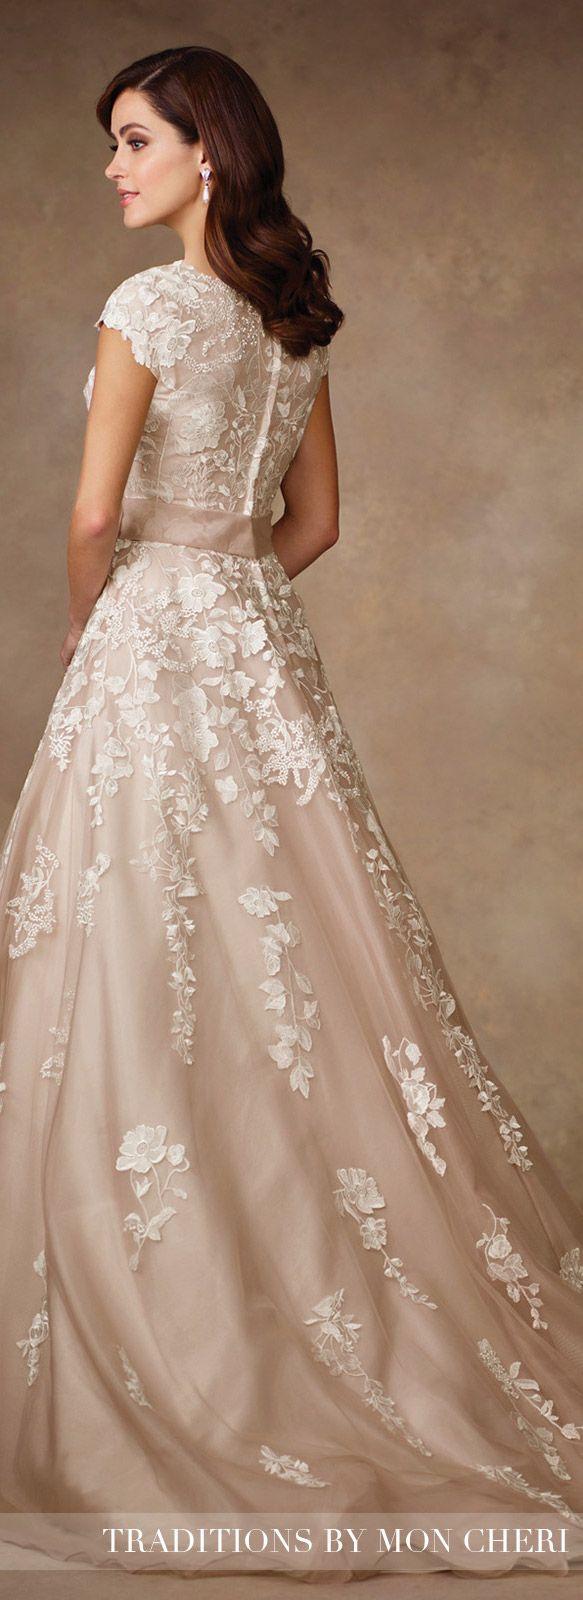 Blush Wedding Dress   Traditions by Mon Cheri